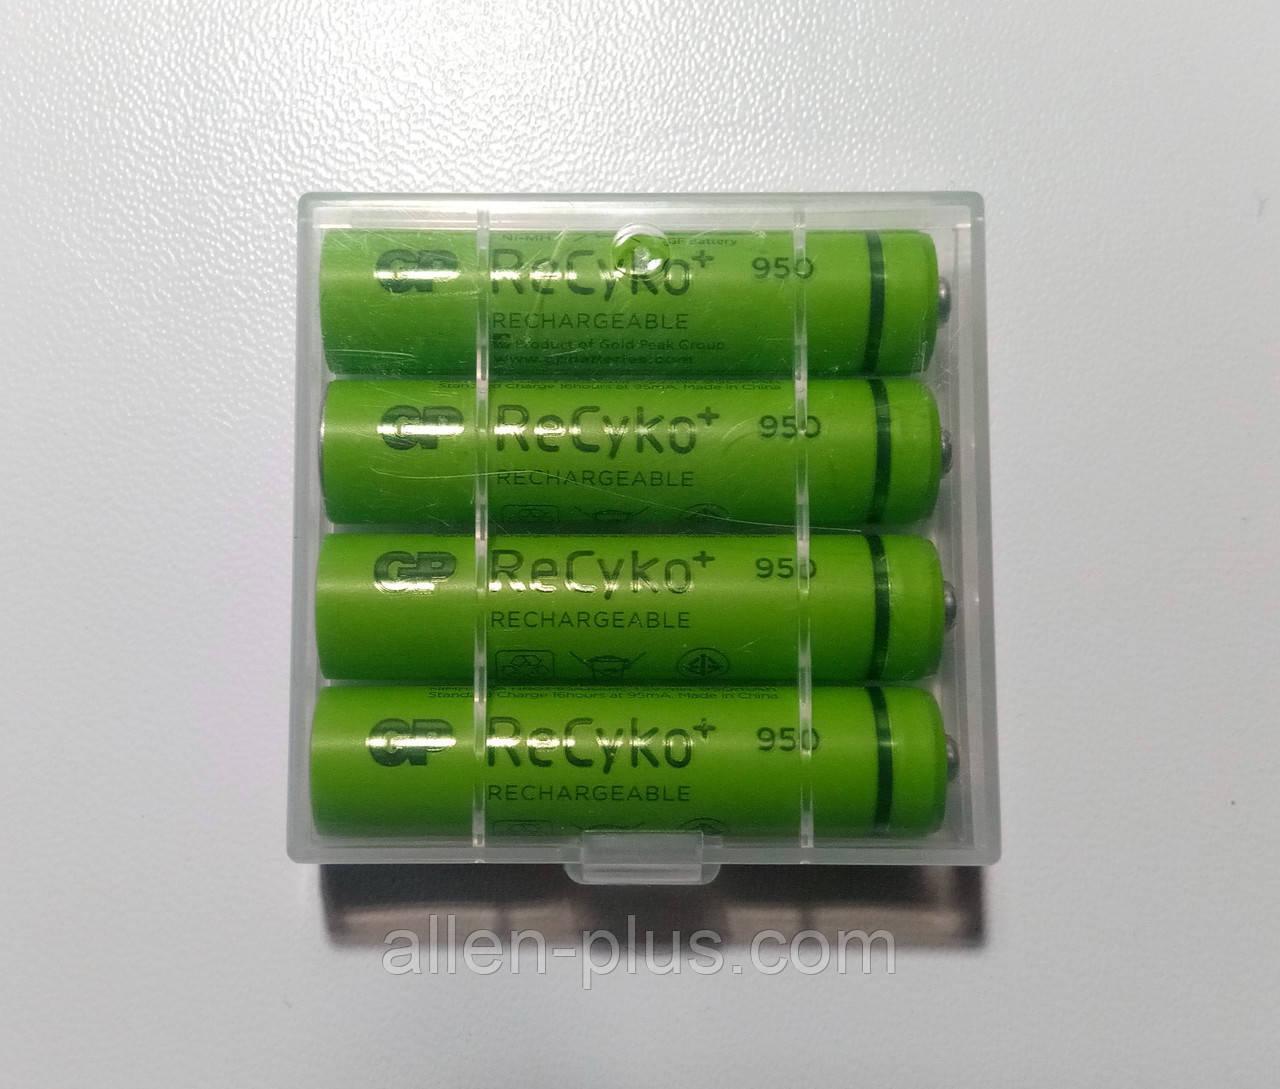 Комплект акумуляторів (4 шт) GP Green Generation ReCyko+ ААА 1.2 V 950mAh Ni-MH